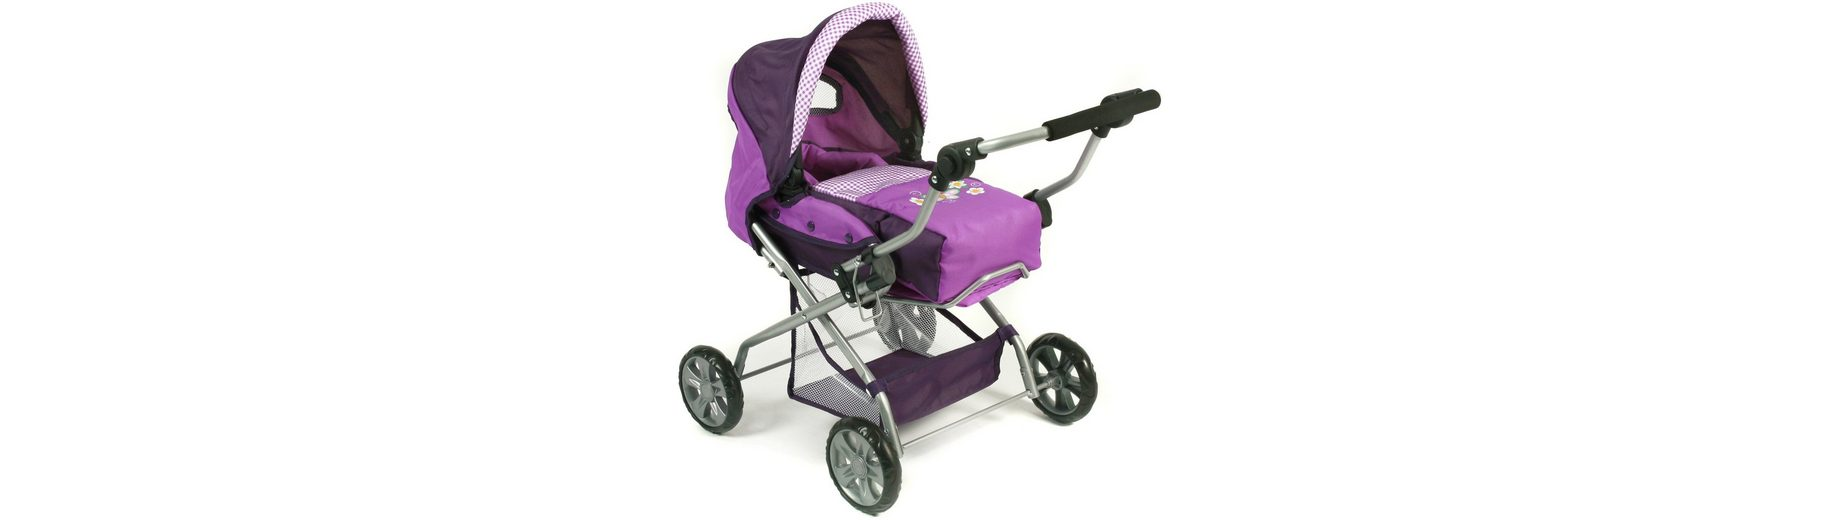 CHIC2000 Kombi Puppenwagen mit herausnehmbarer Tragetasche, »PICCOLINA Purple«